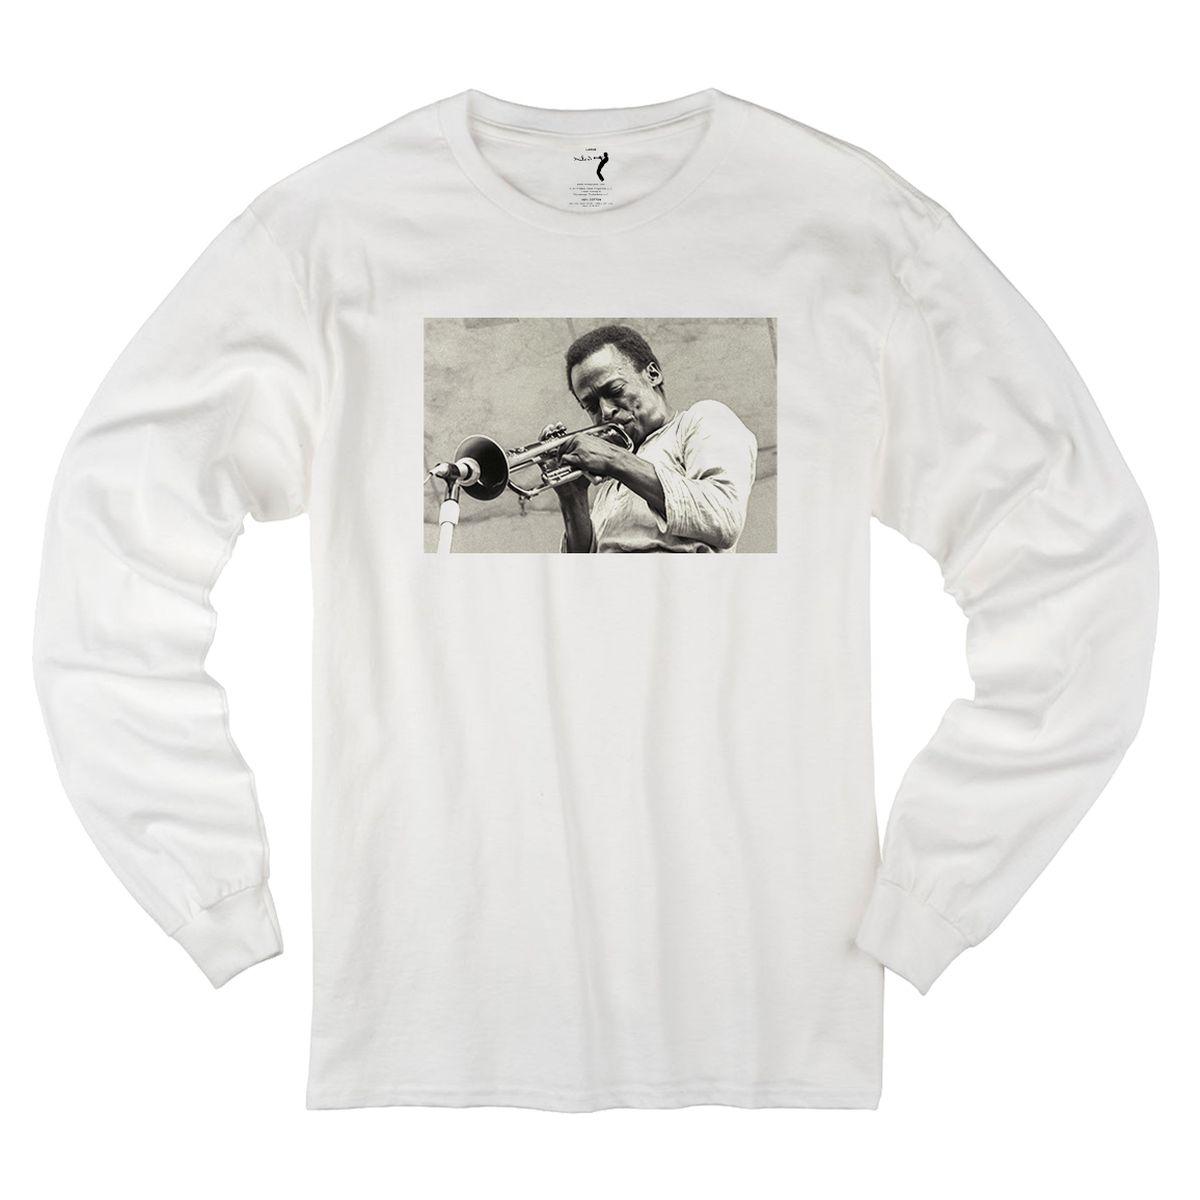 Miles Davis Central Park 1970 White Long Sleeve T-shirt